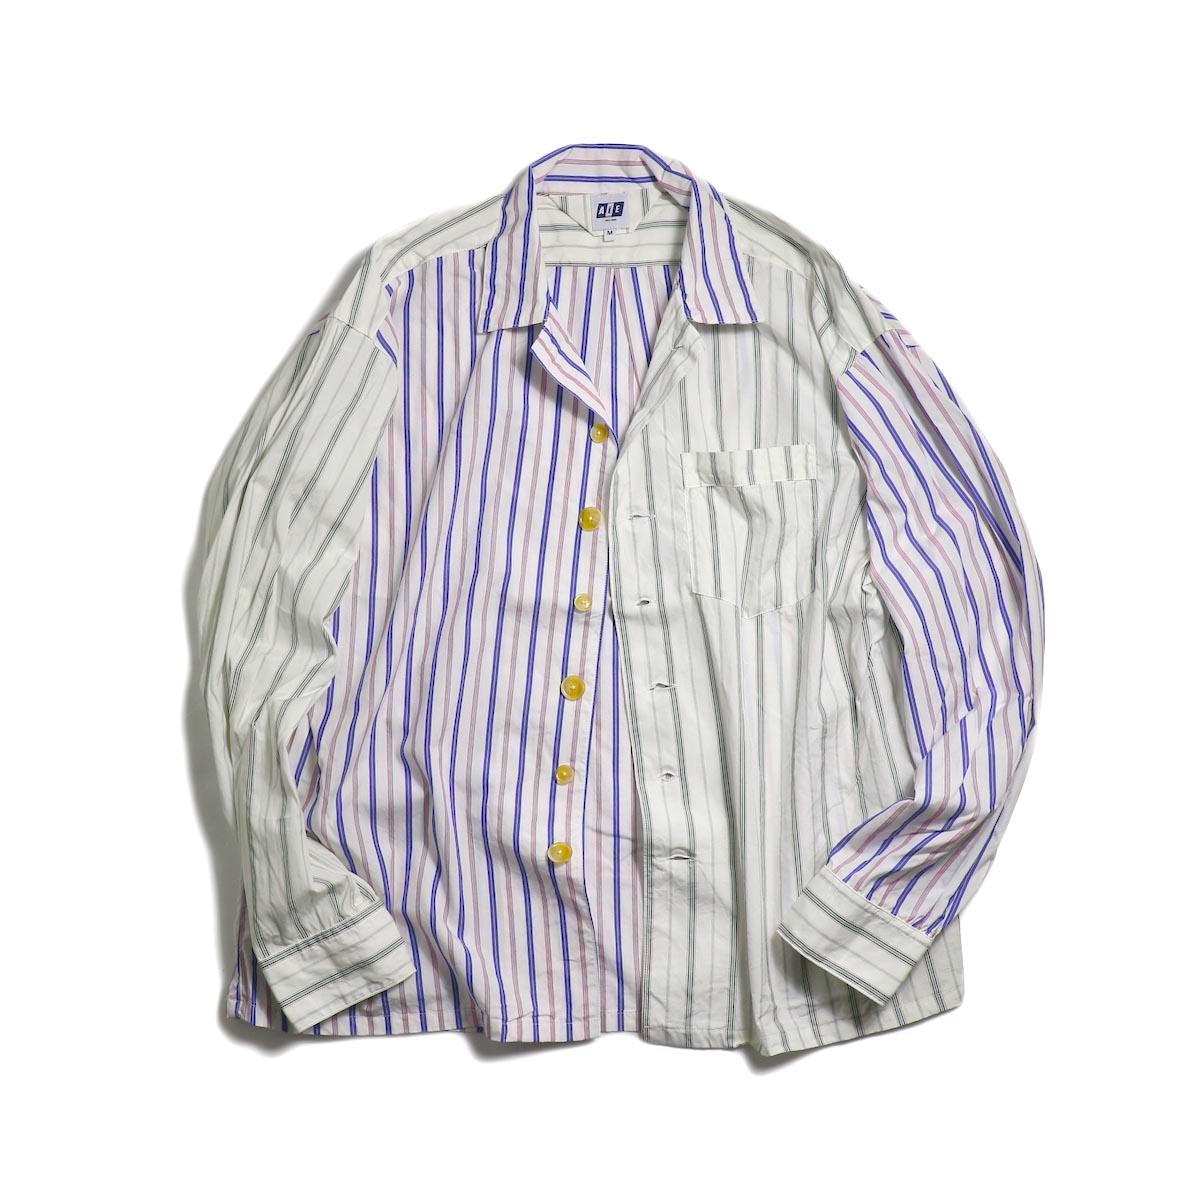 AiE / PJ Shirt -Regent St. (Red/Blu/Wht)